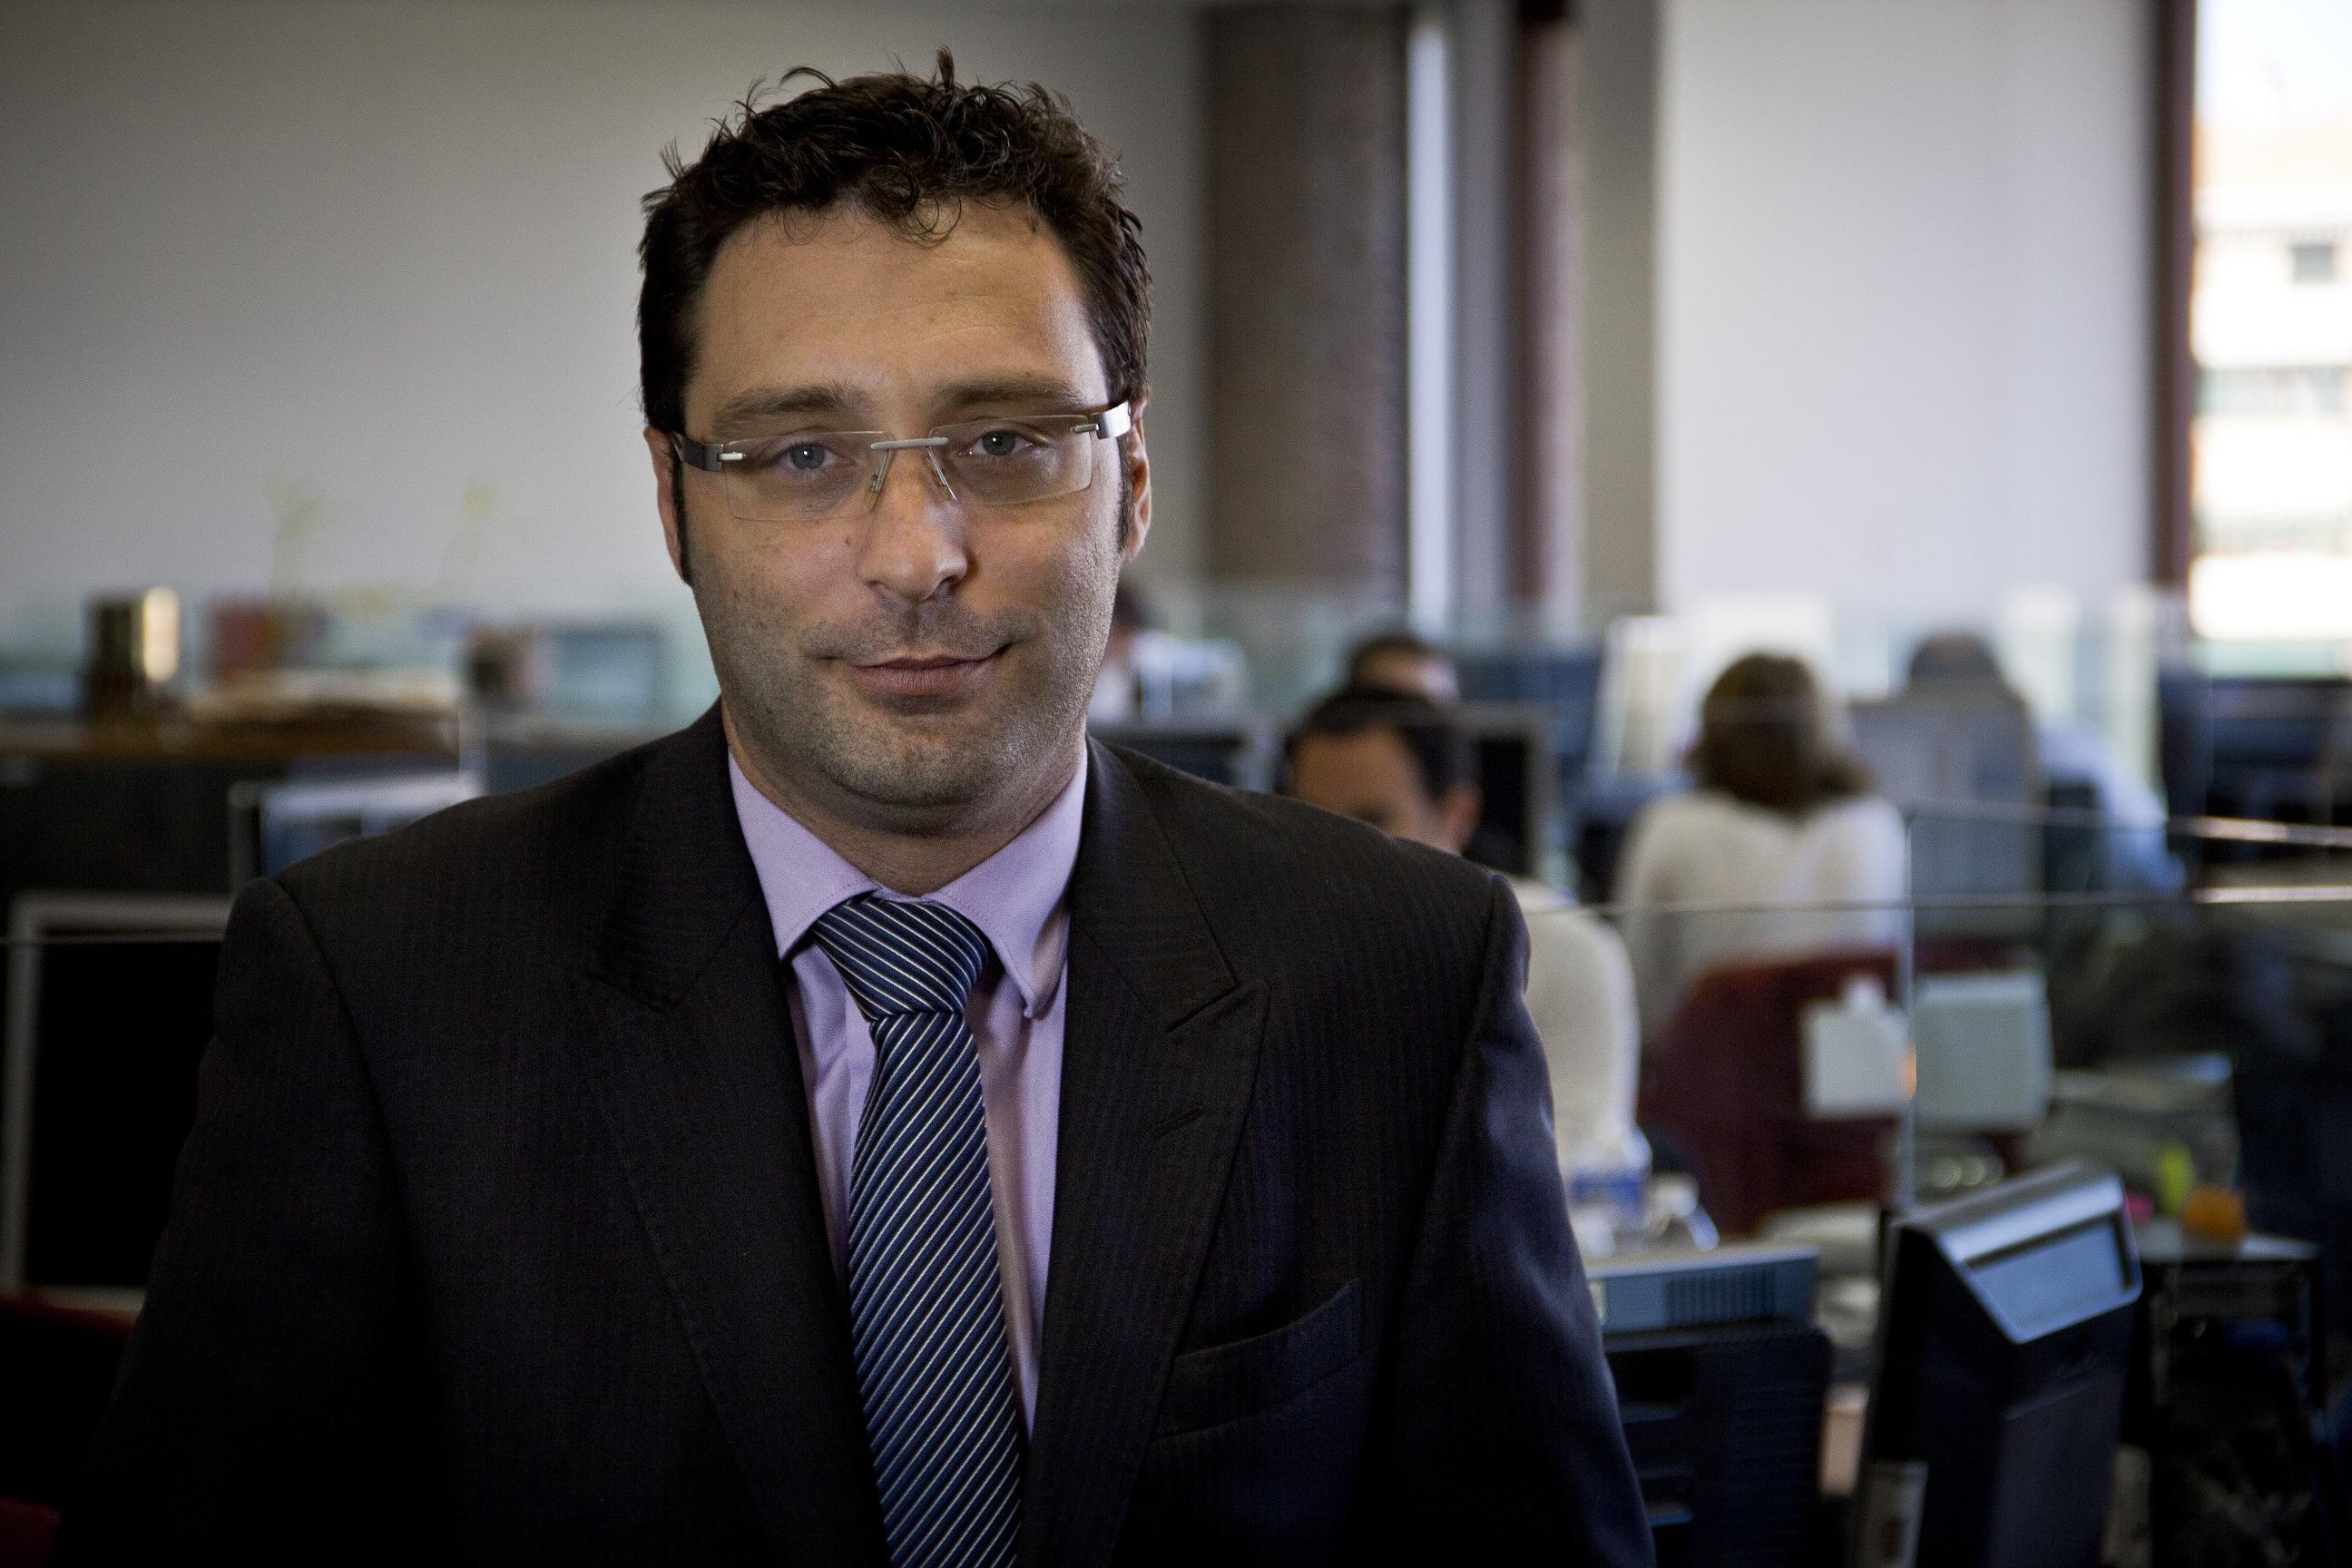 David Navarro: 'No es España como país al que están atacando, son valores con exposición a emergentes los dañados'